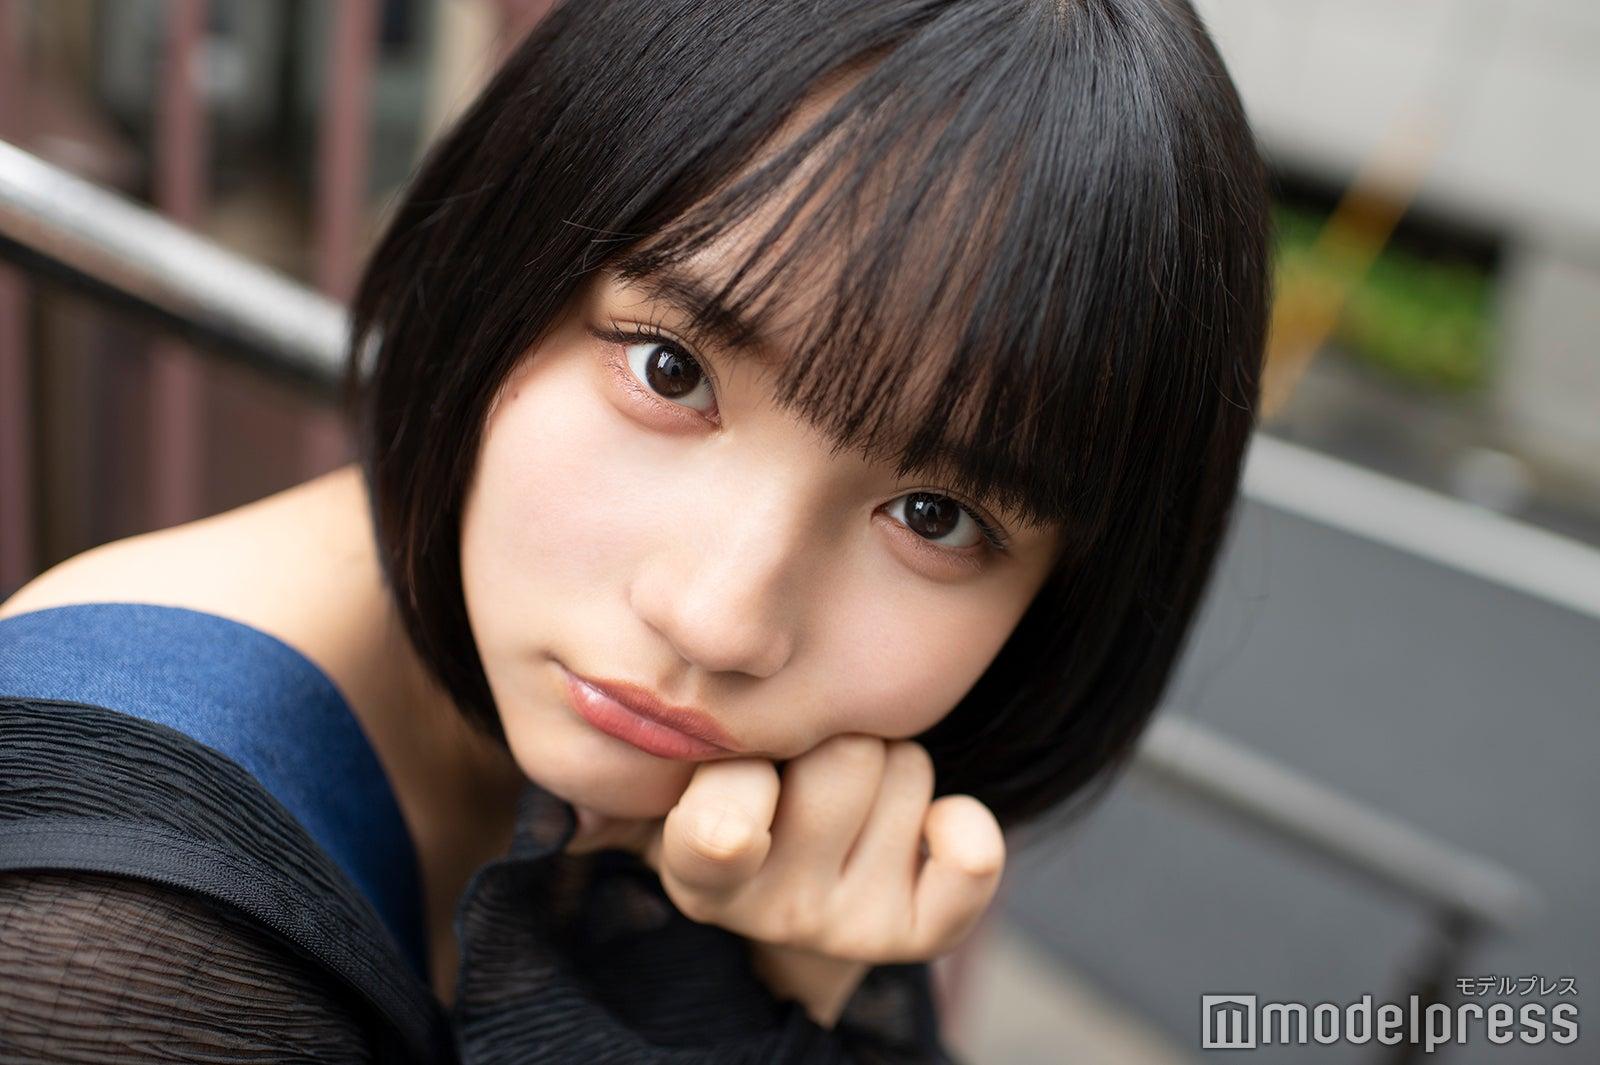 AKB48新センター矢作萌夏、写真集「自分図鑑」インタビュー